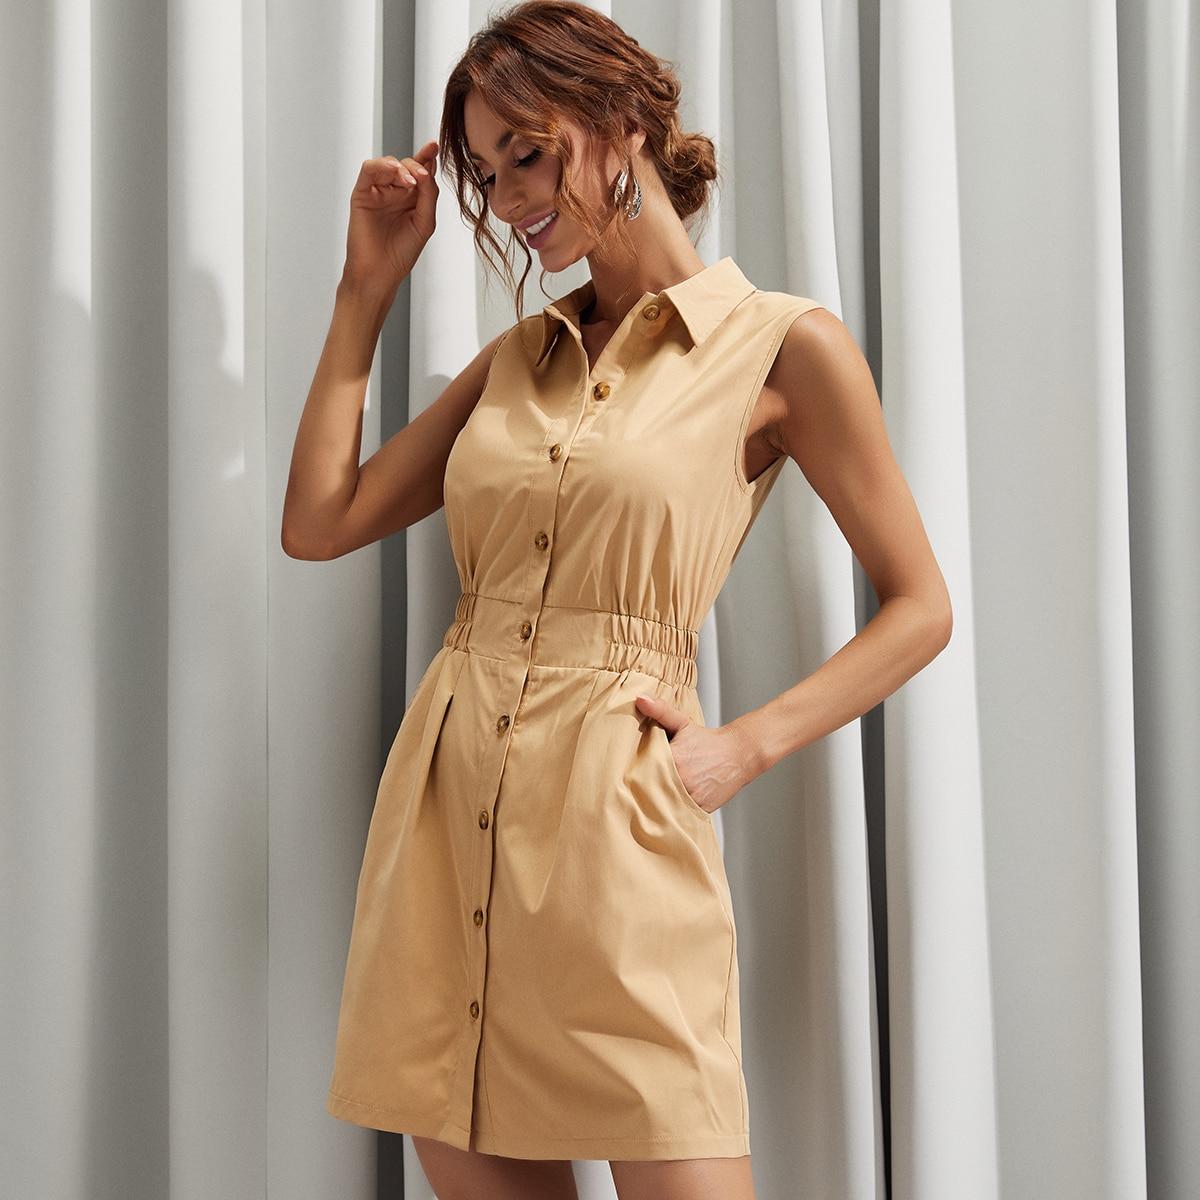 Sleeveless Shirt Dress, SHEIN  - buy with discount